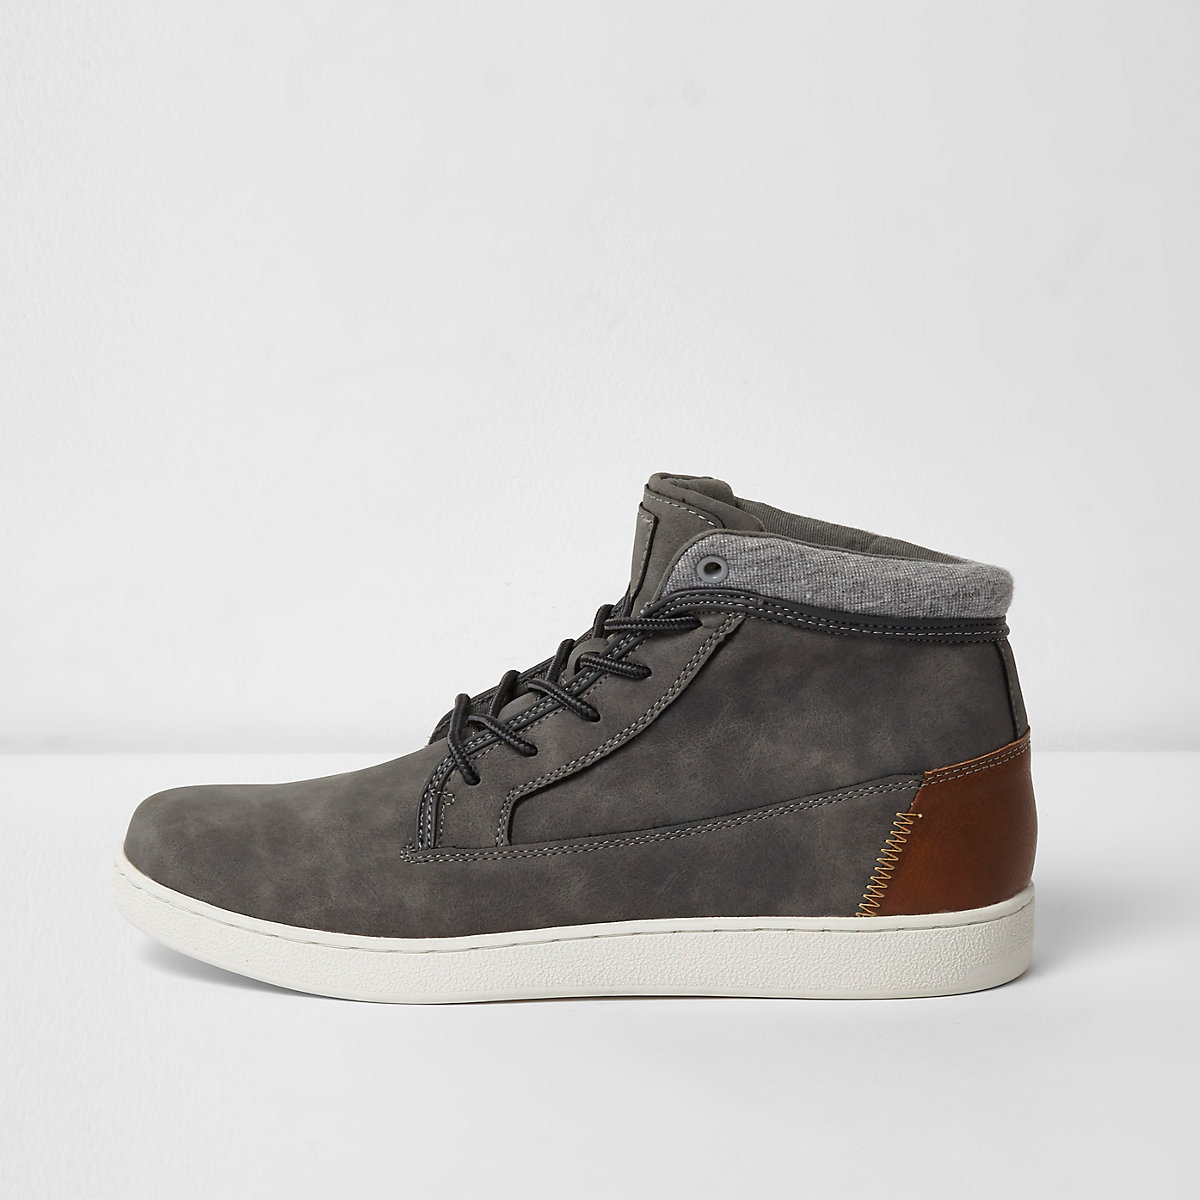 Grey high top sneakers